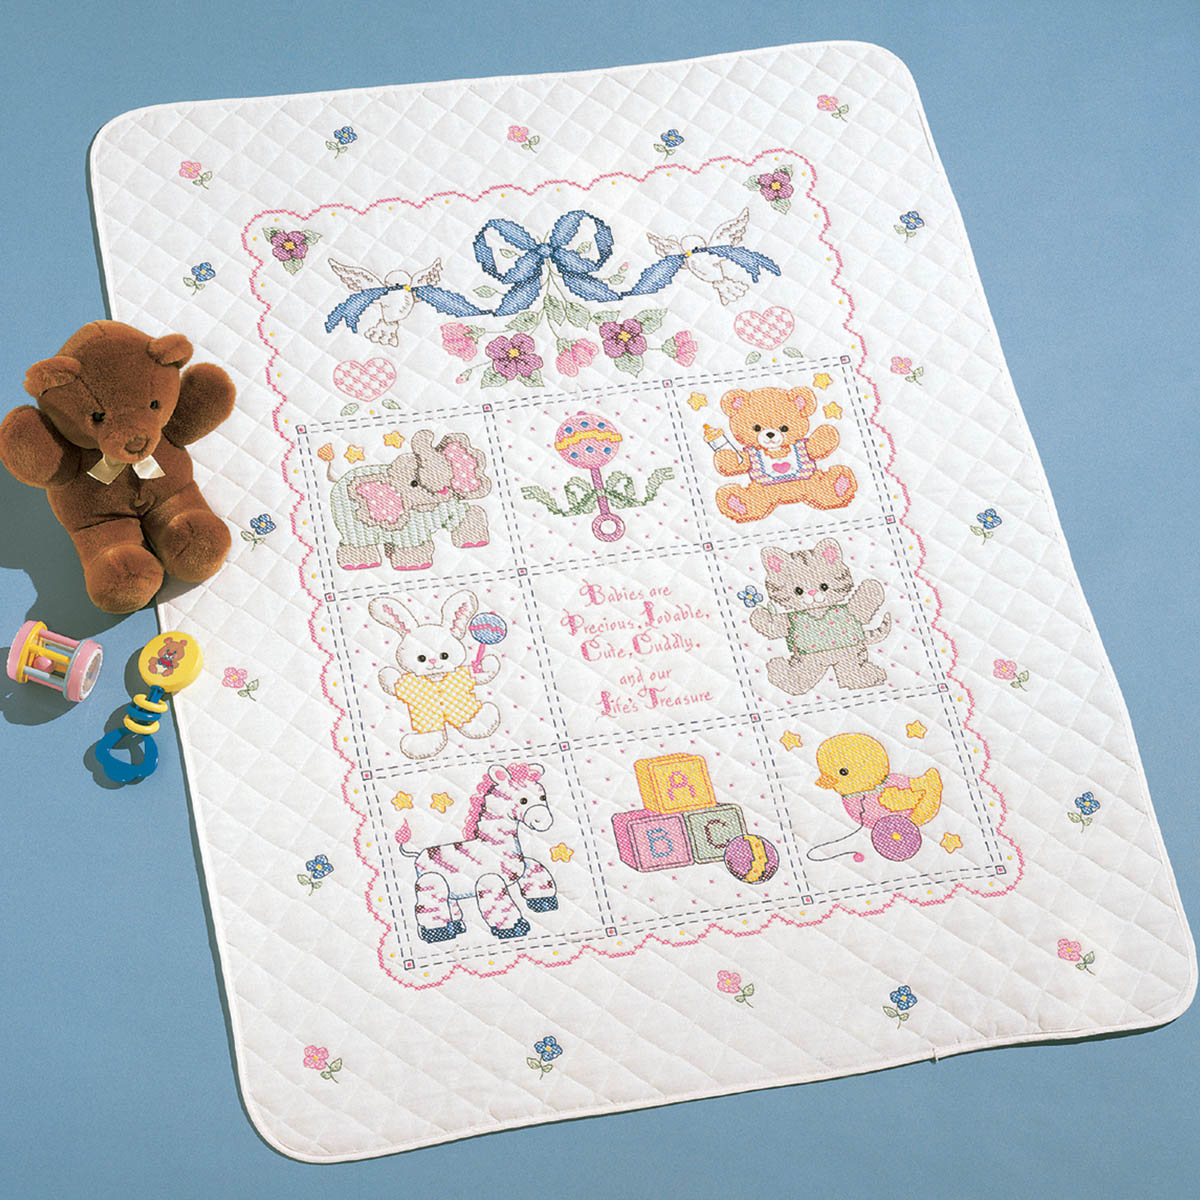 Bucilla ® Baby - Stamped Cross Stitch - Crib Ensembles - Babies Are Precious - Crib Cover Kit